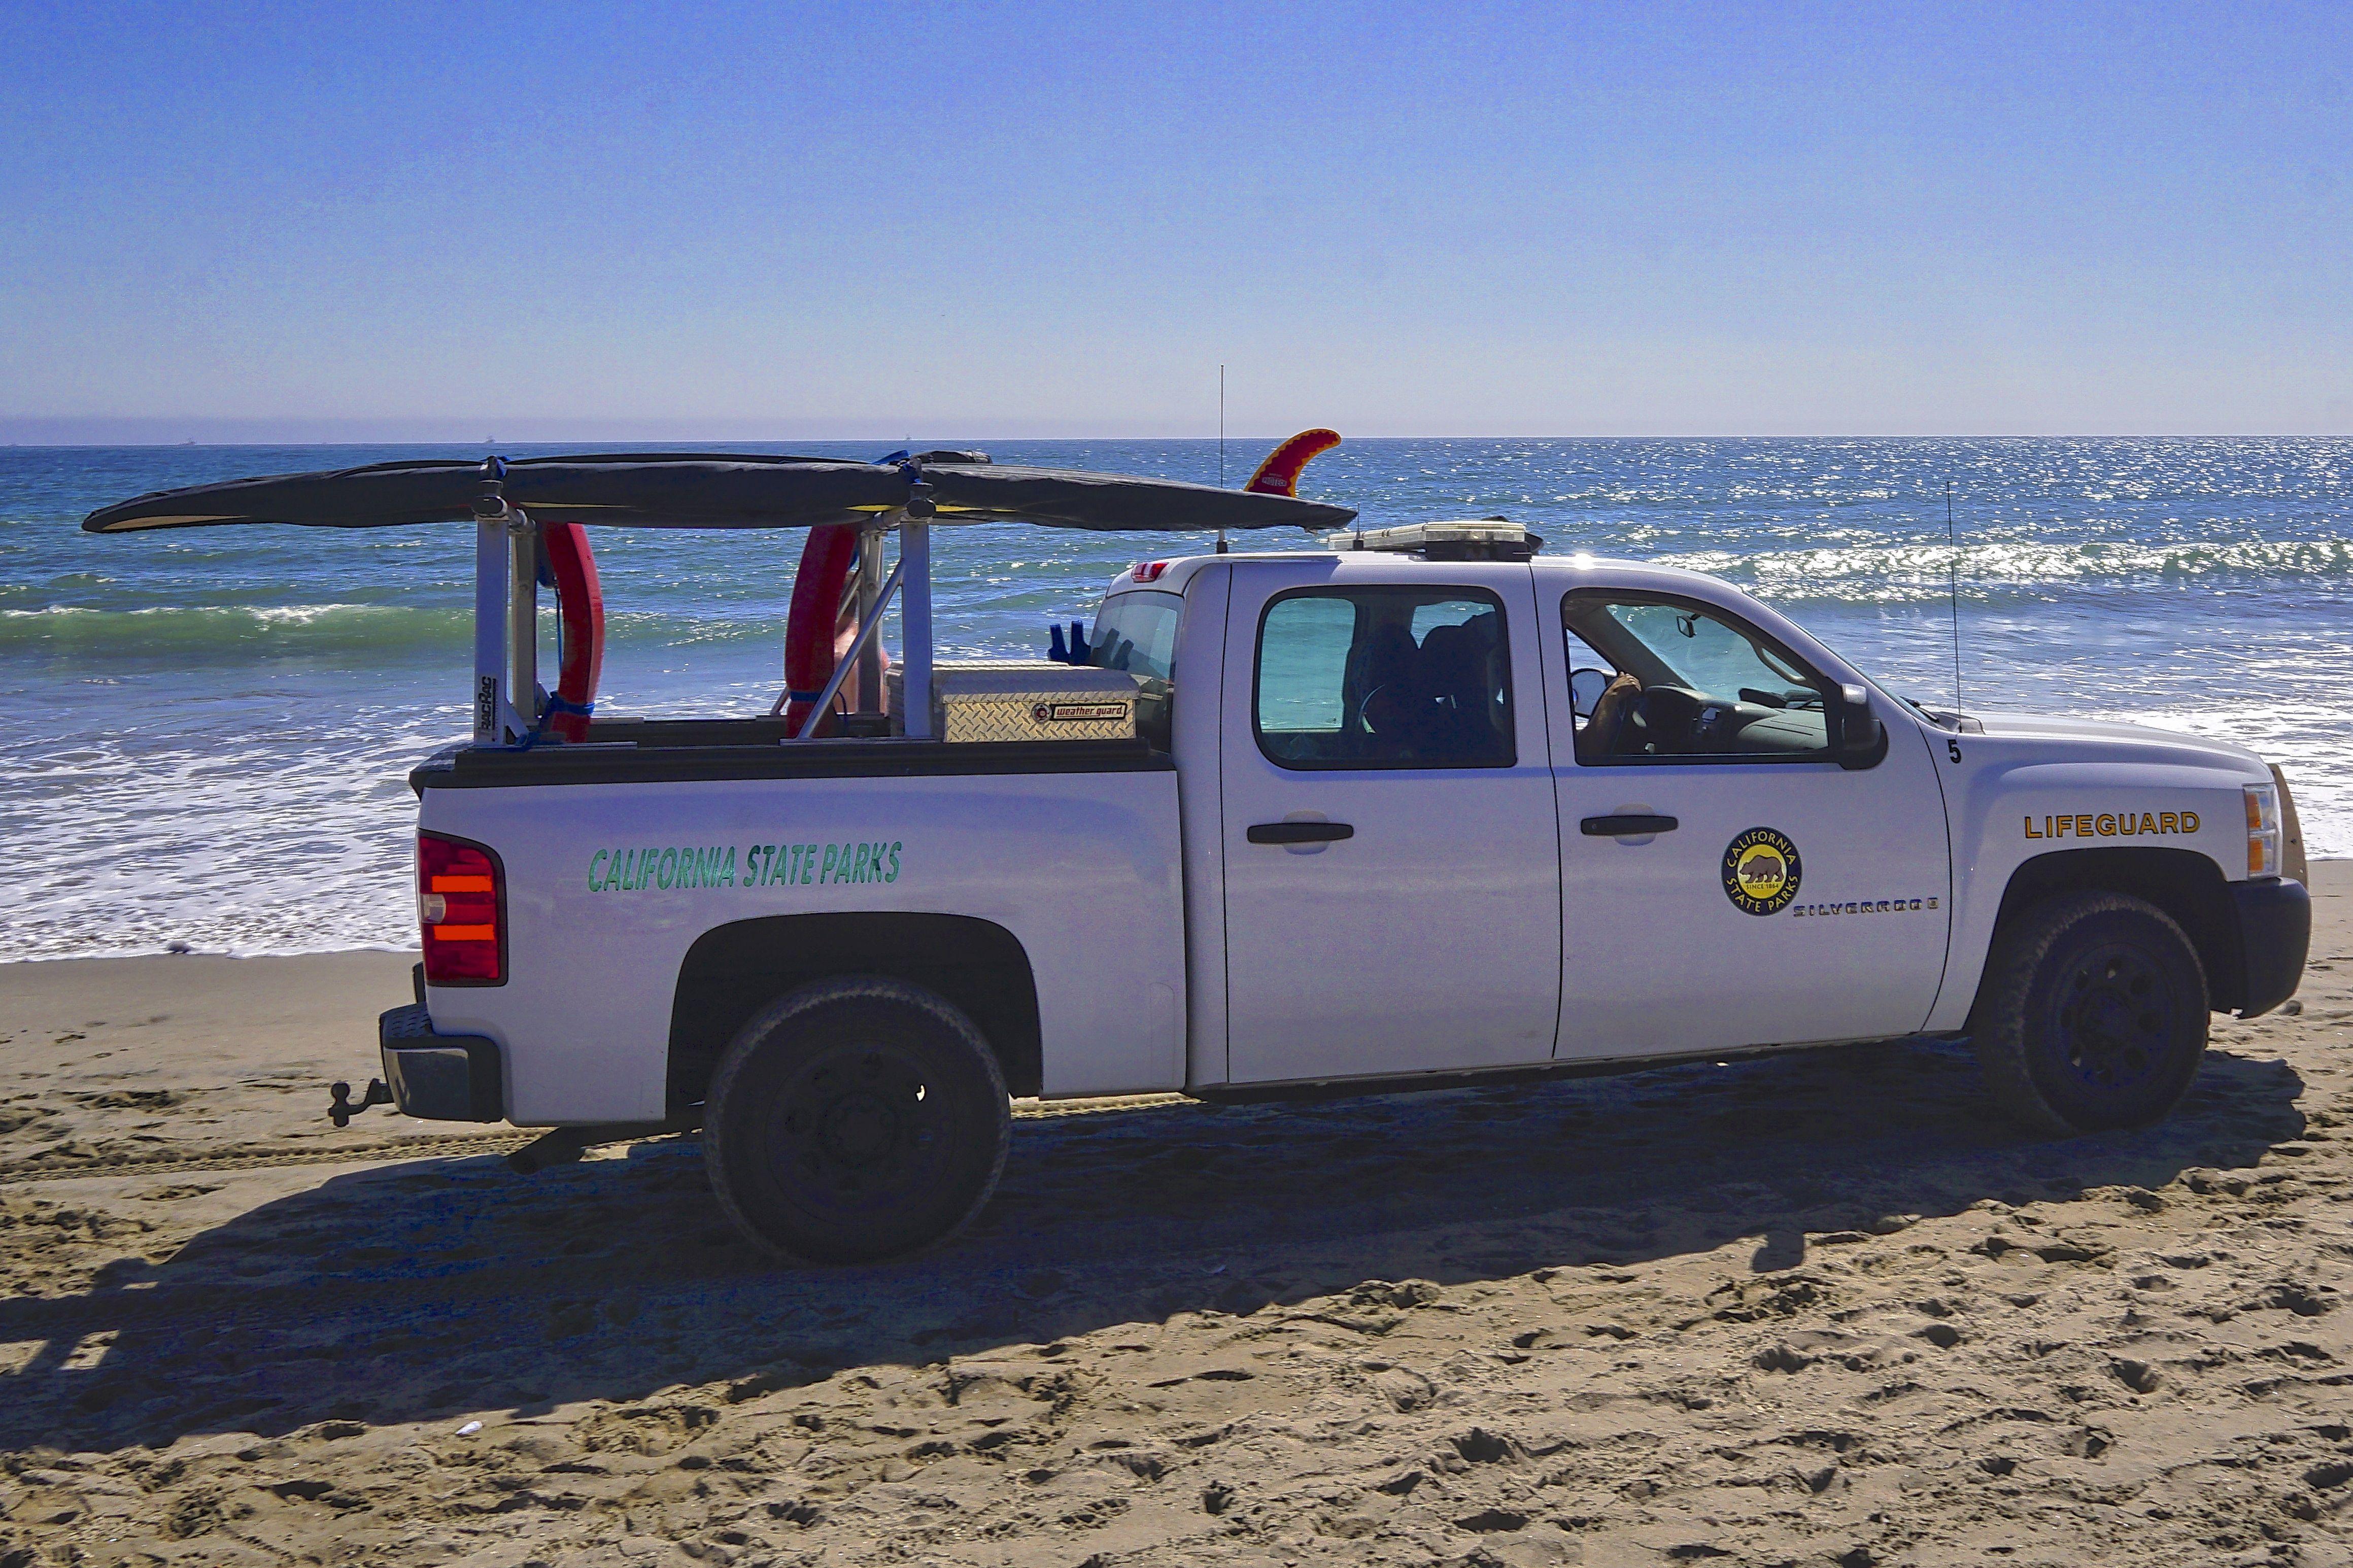 California State Parks Lifeguard Chevrolet Silverado. 2016